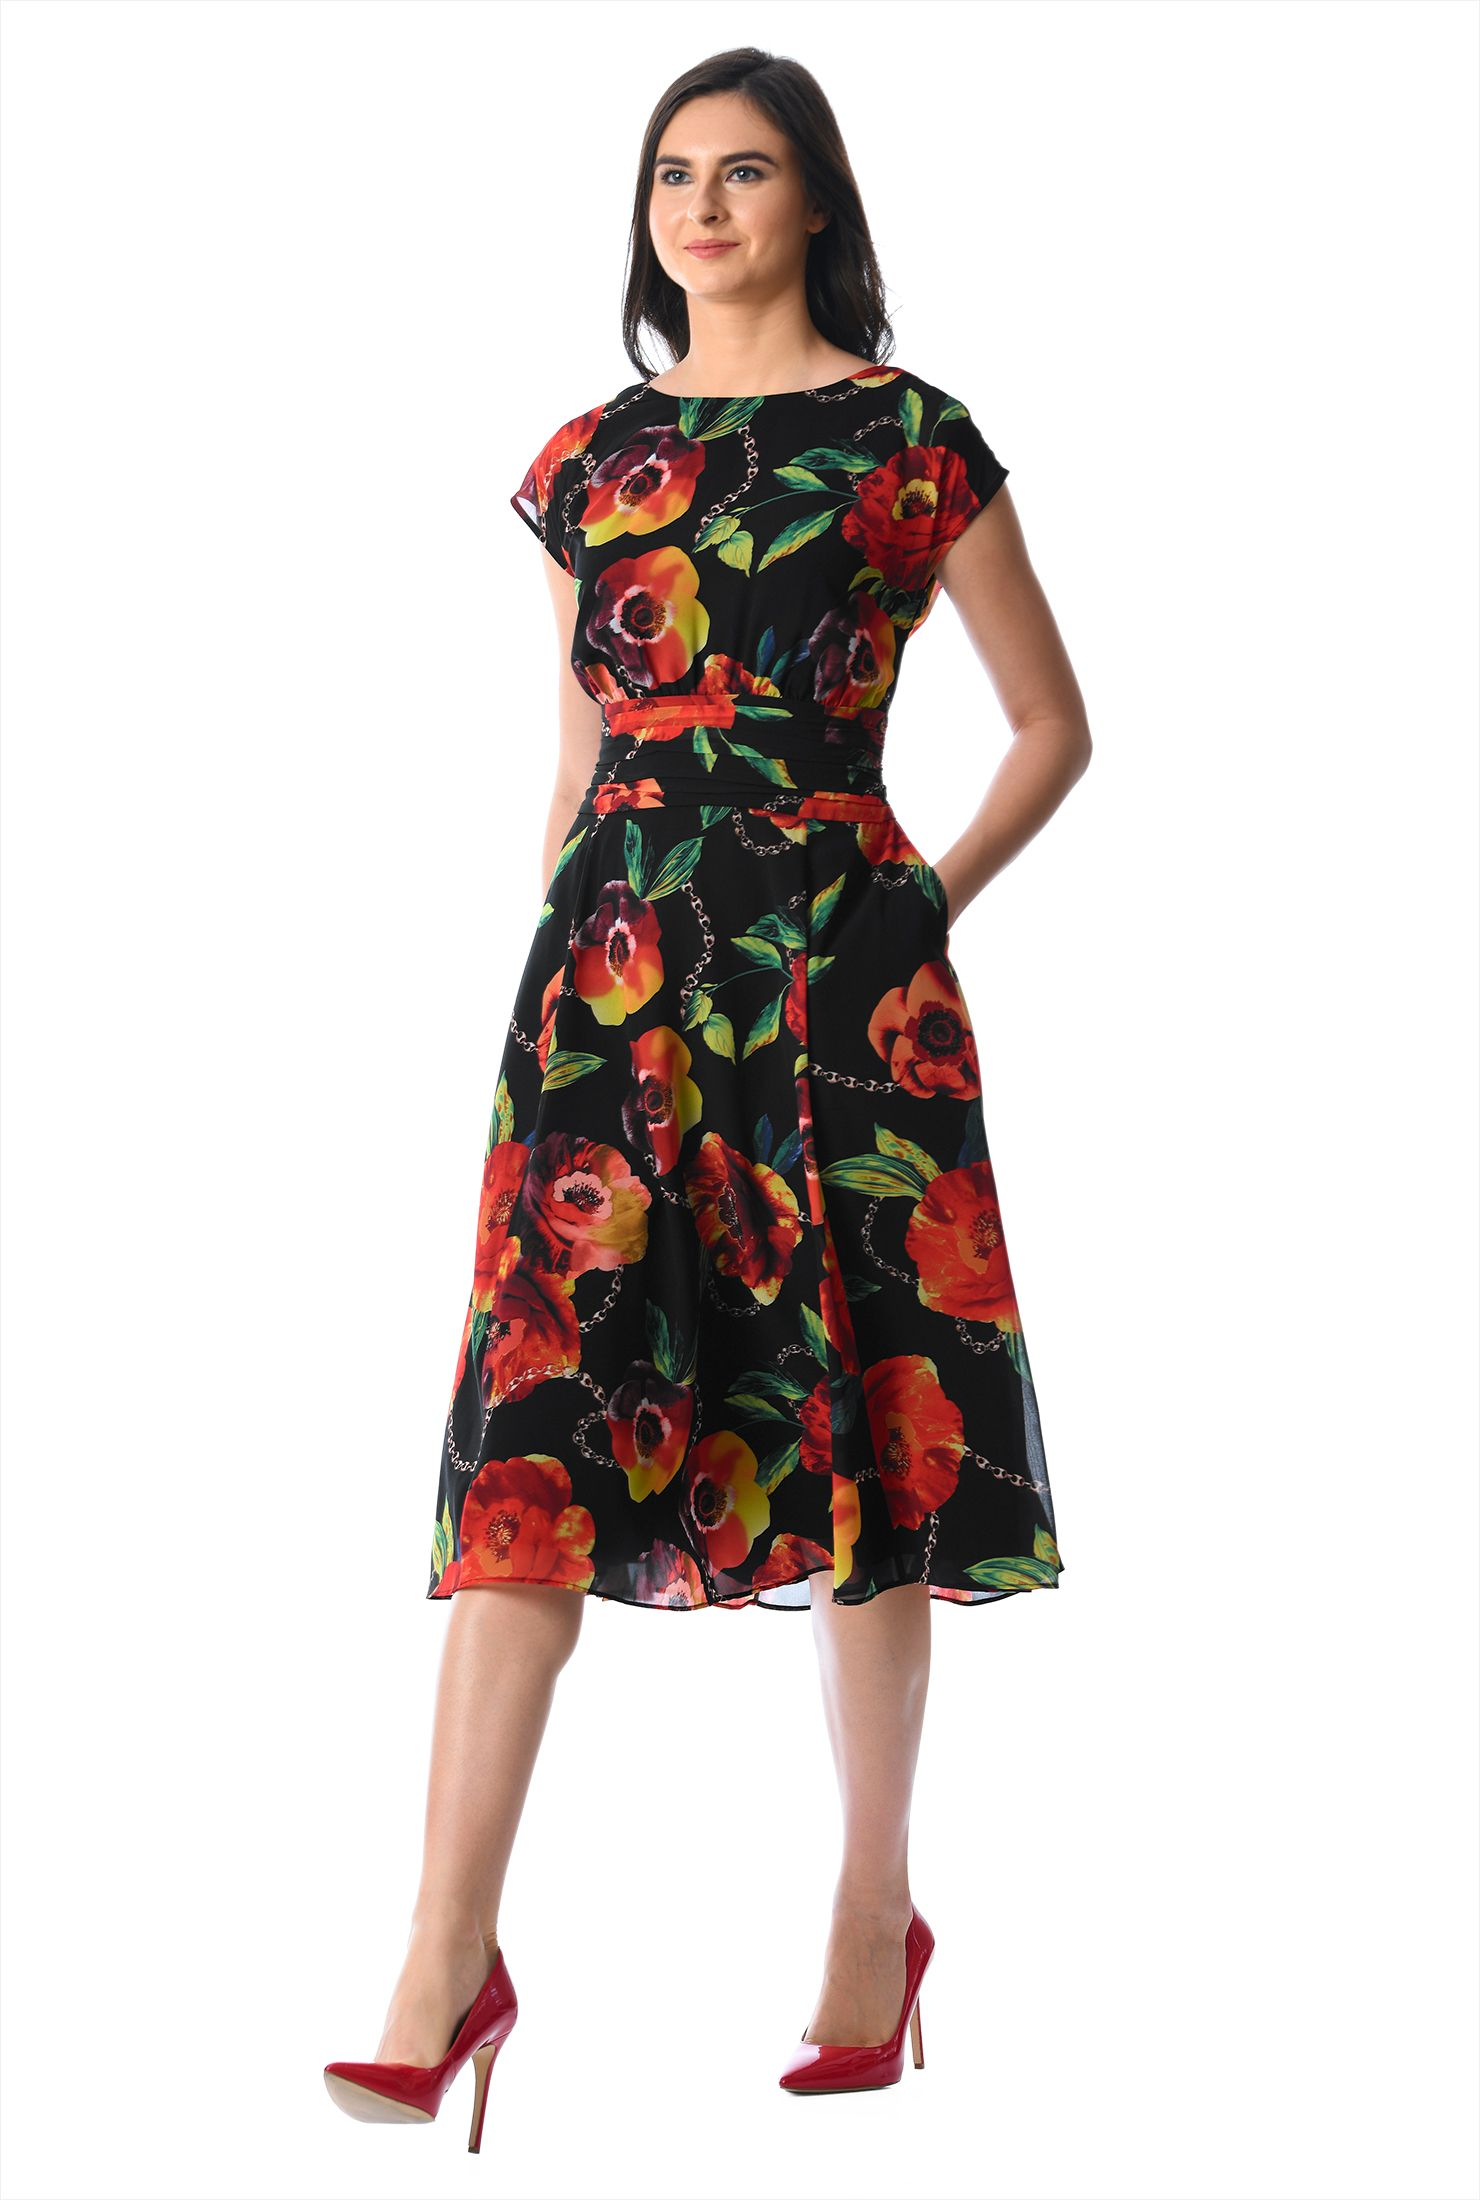 f7a9e798eeb Women's Fashion Clothing 0-36W and Custom   My Style   Dresses ...